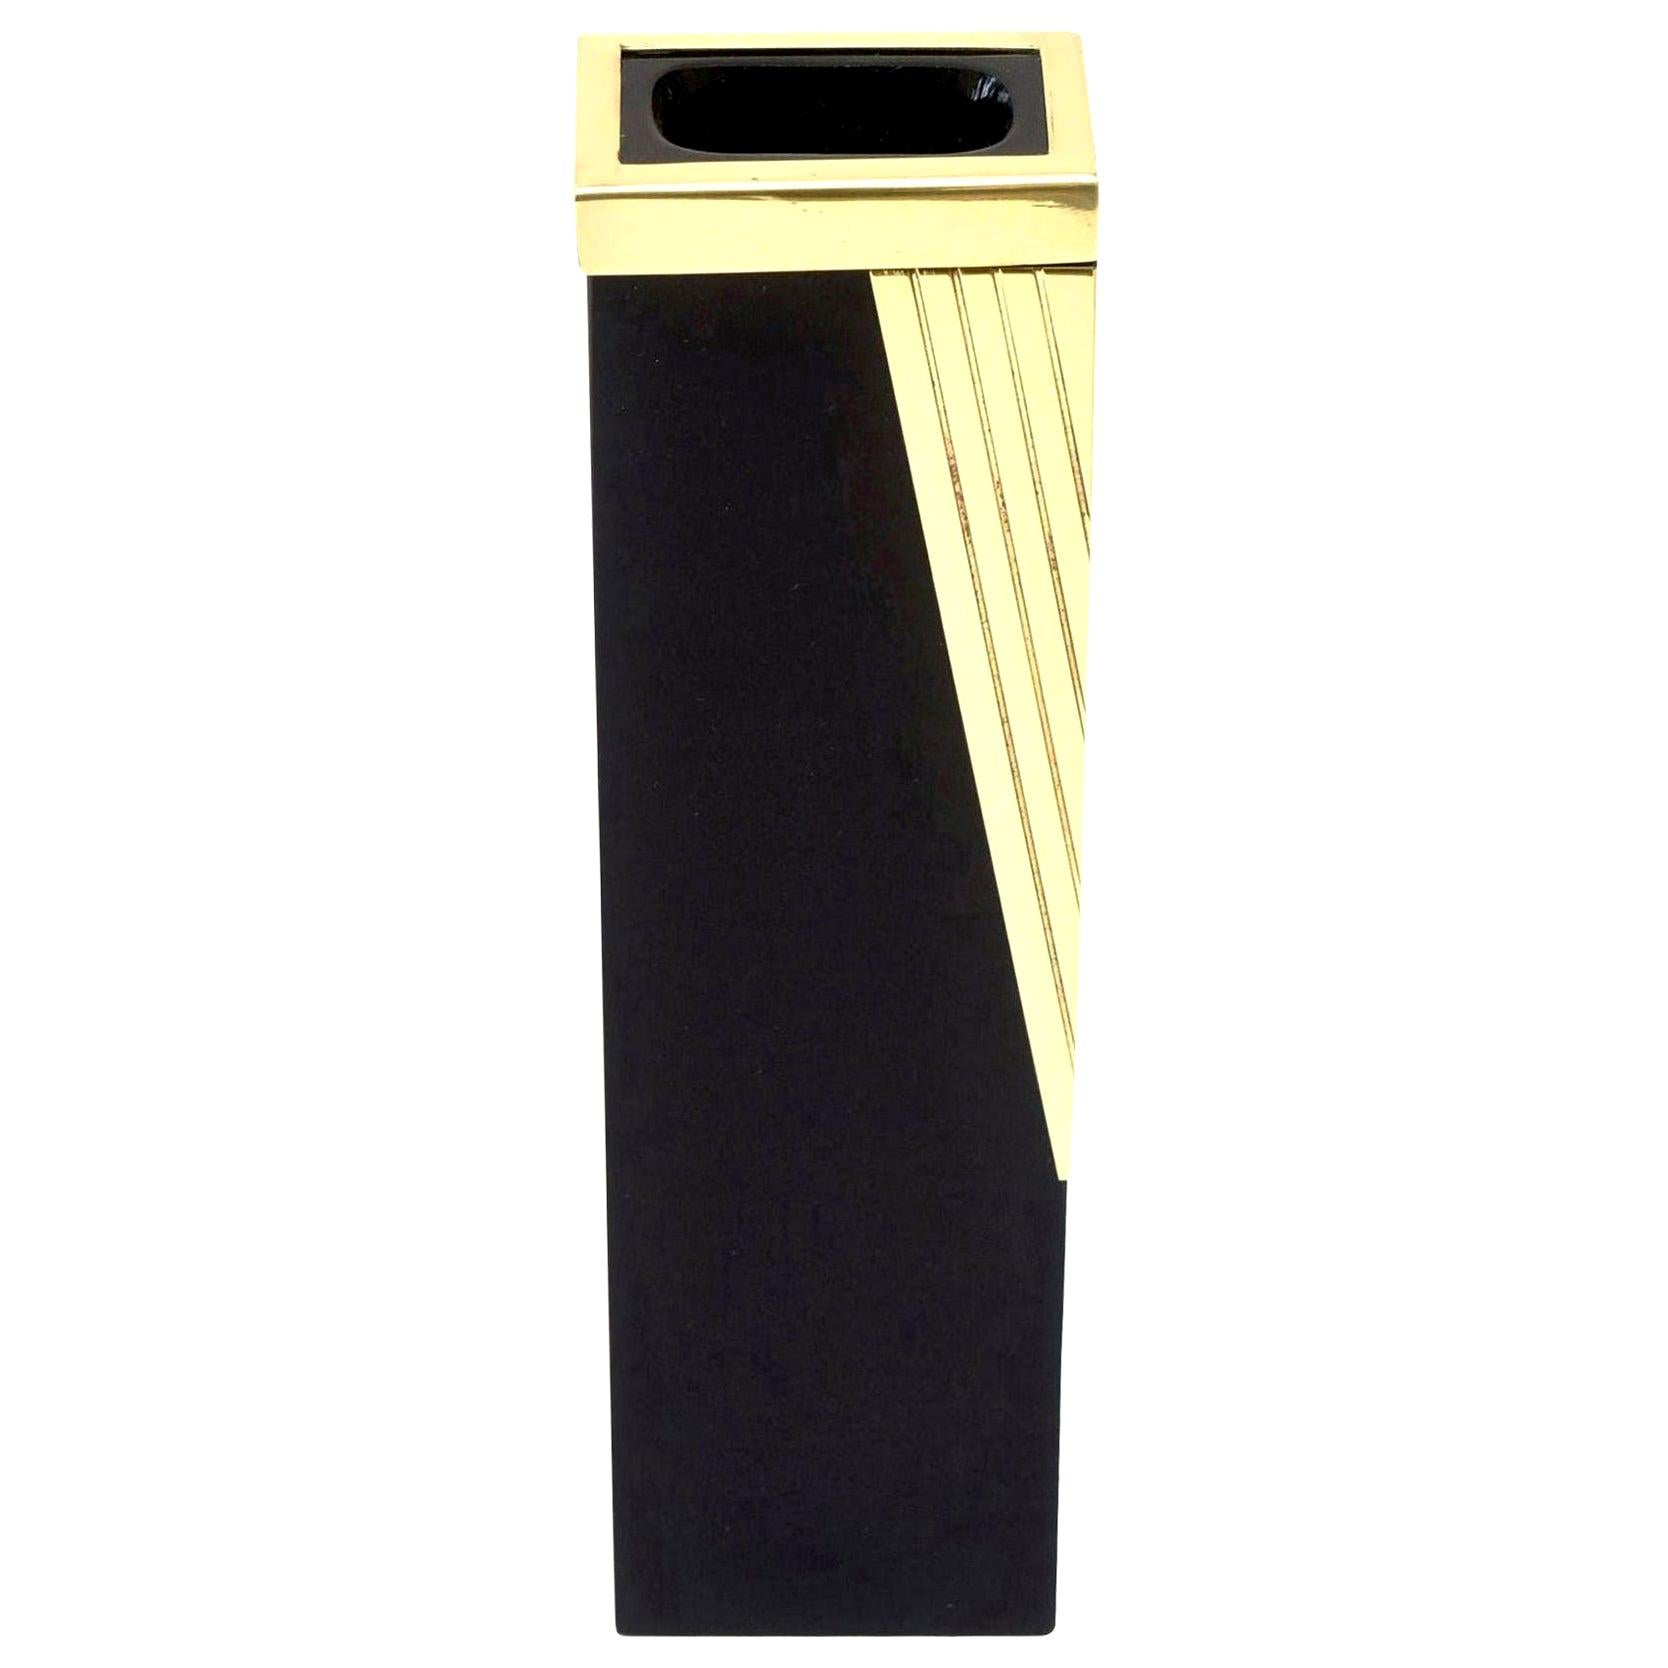 Murano Black Glass and Brass Draped Vase or Bud Vase Vintage Italian